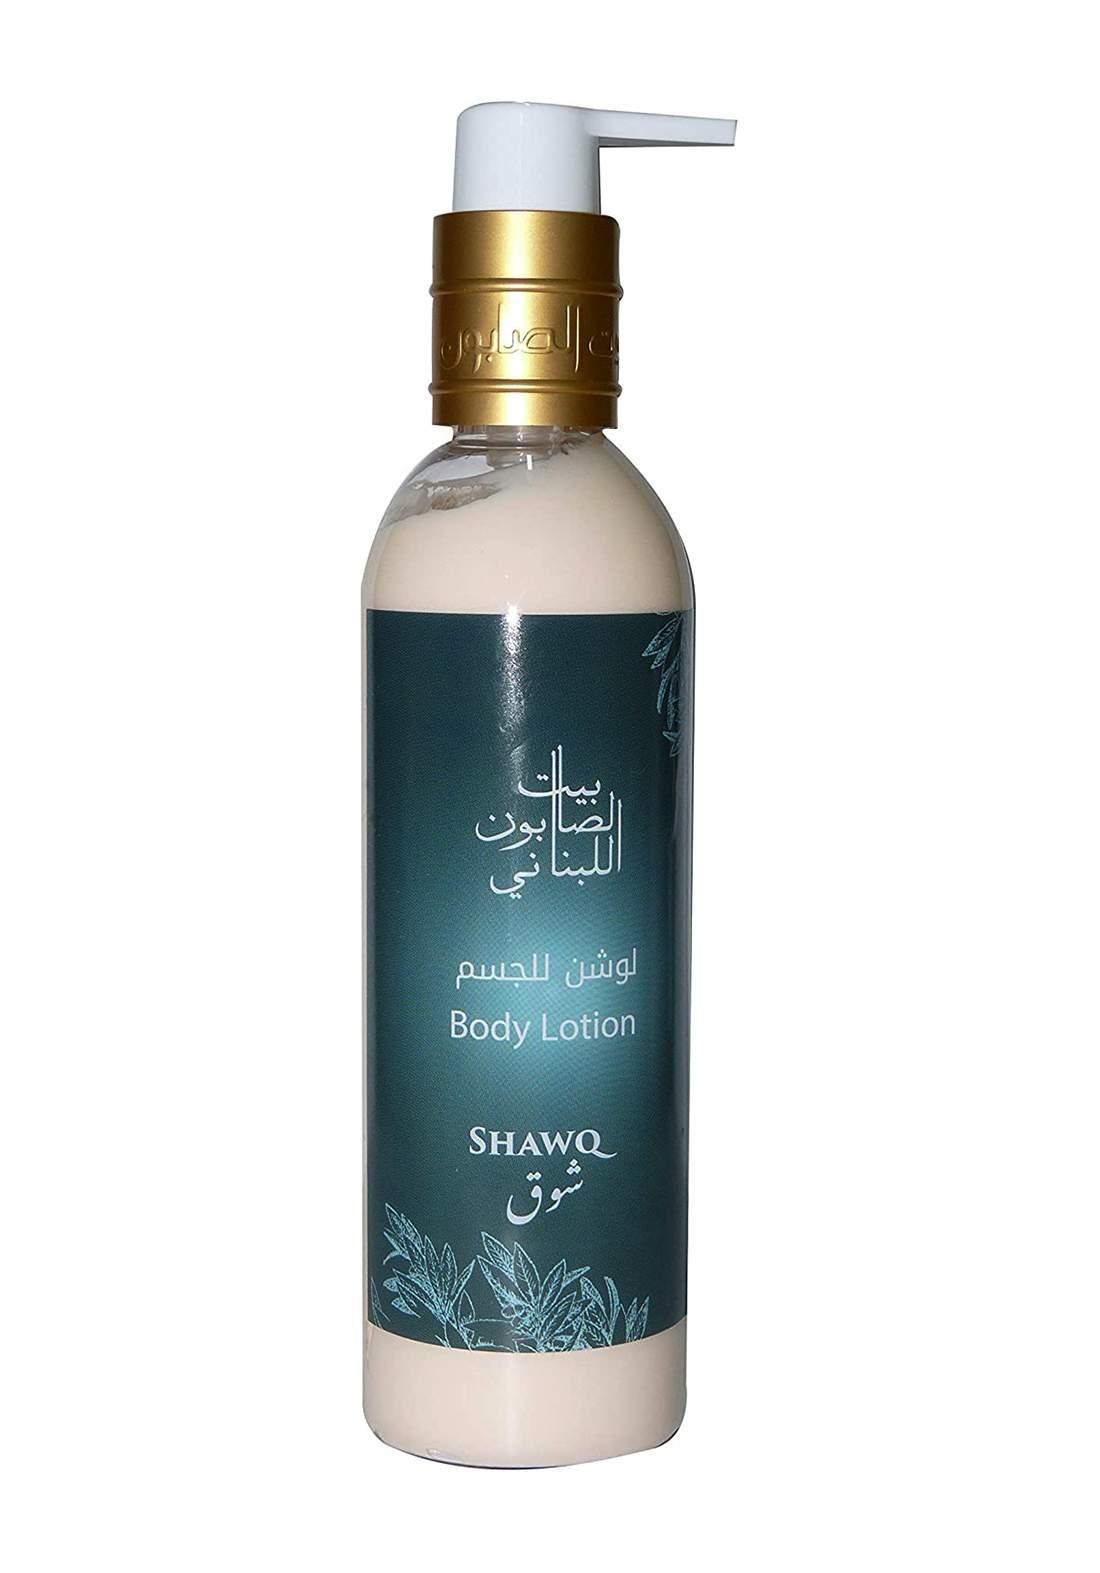 Bayt Alsaboun Alloubnani-317462 Body Lotion Shawq 250ml لوشن